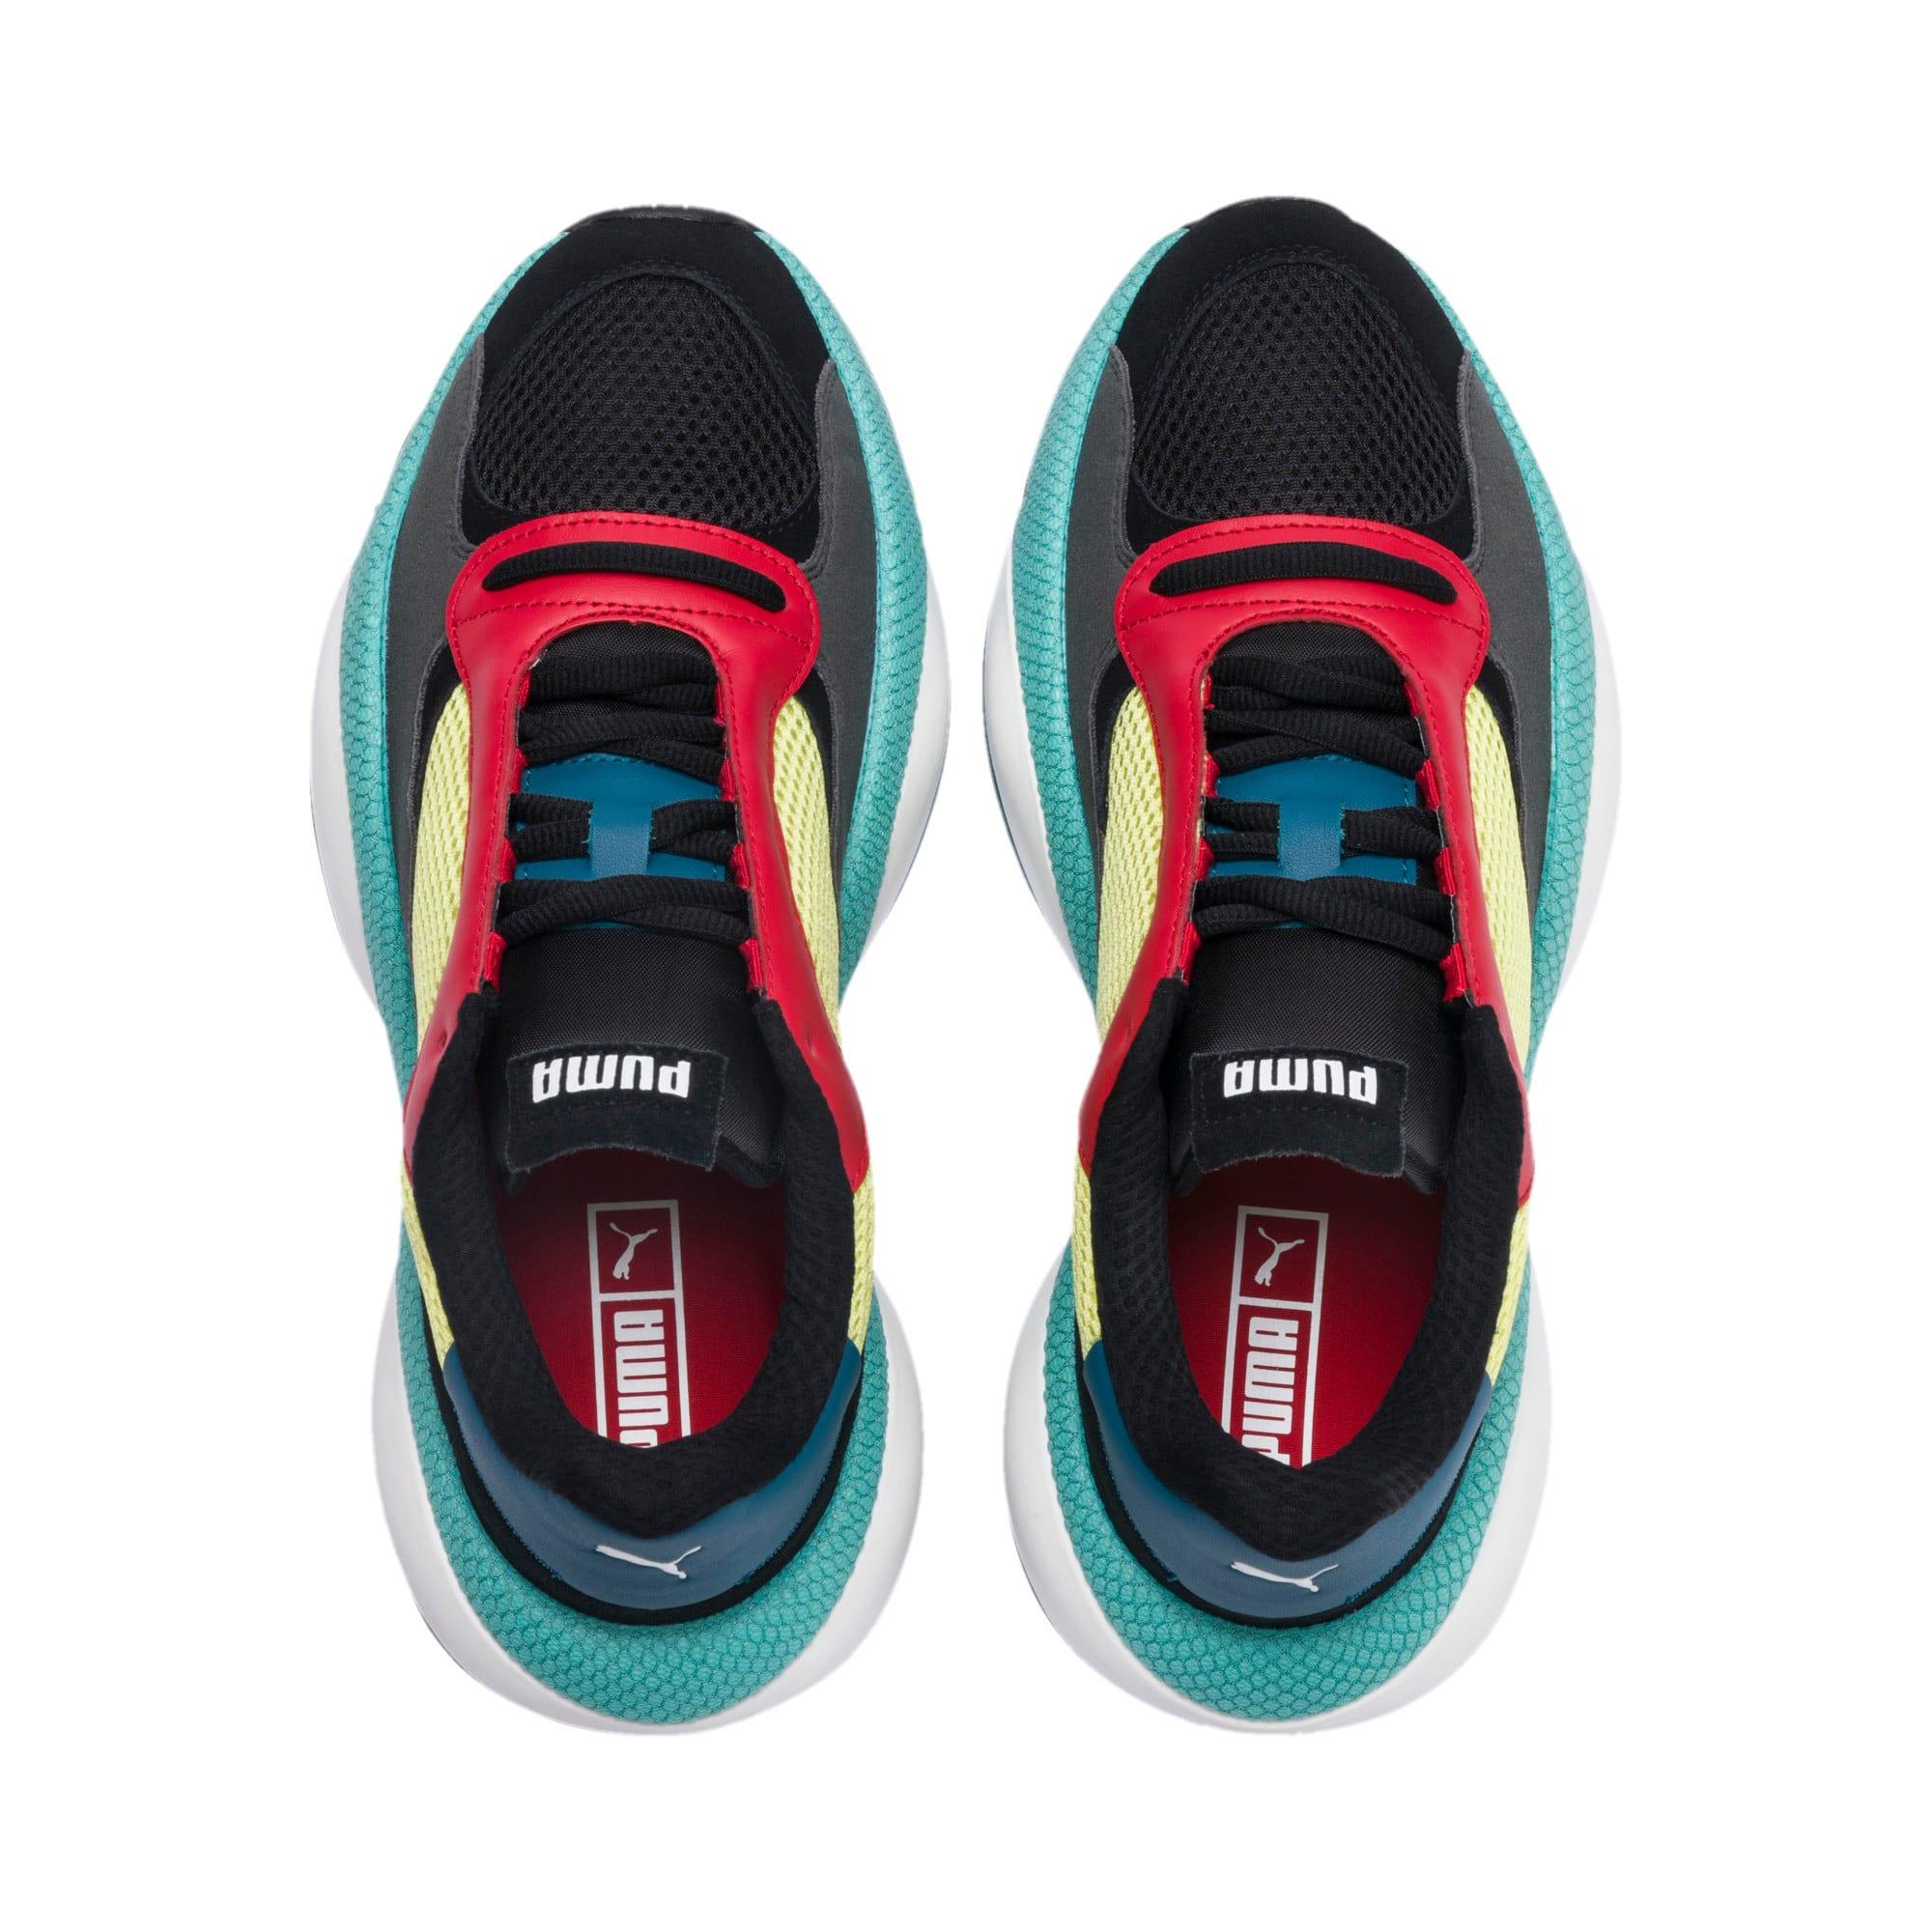 Thumbnail 6 of Alteration Kurve Sneakers, Puma Black-Limelight, medium